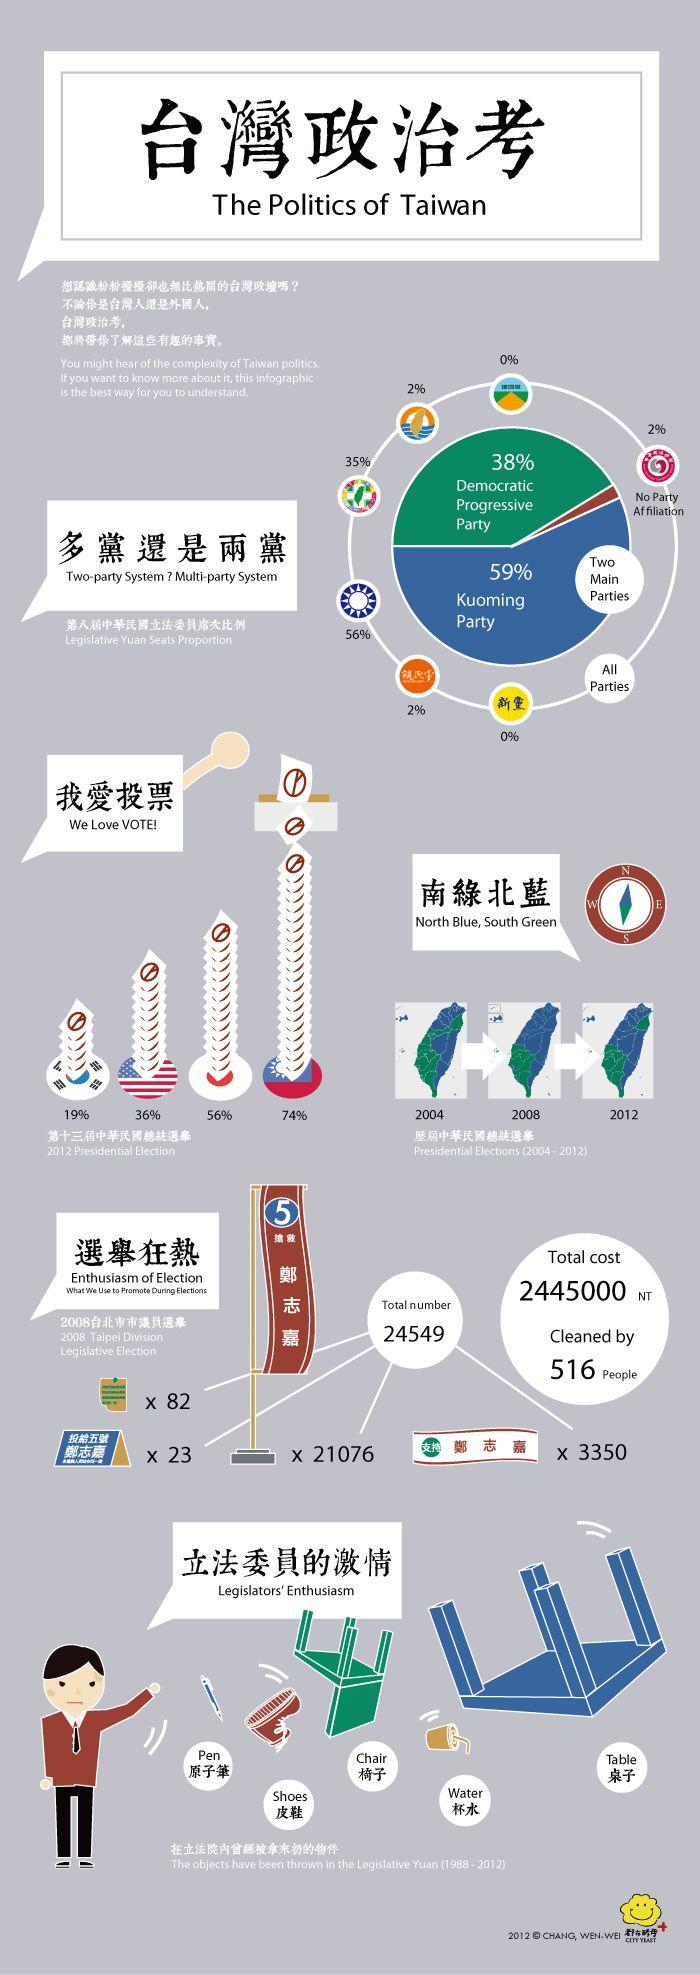 水越設計, 都市酵母, city yeast, AGUA Design, 臺灣, 臺北, taipei, food, 食物, 臺灣美食, infographic